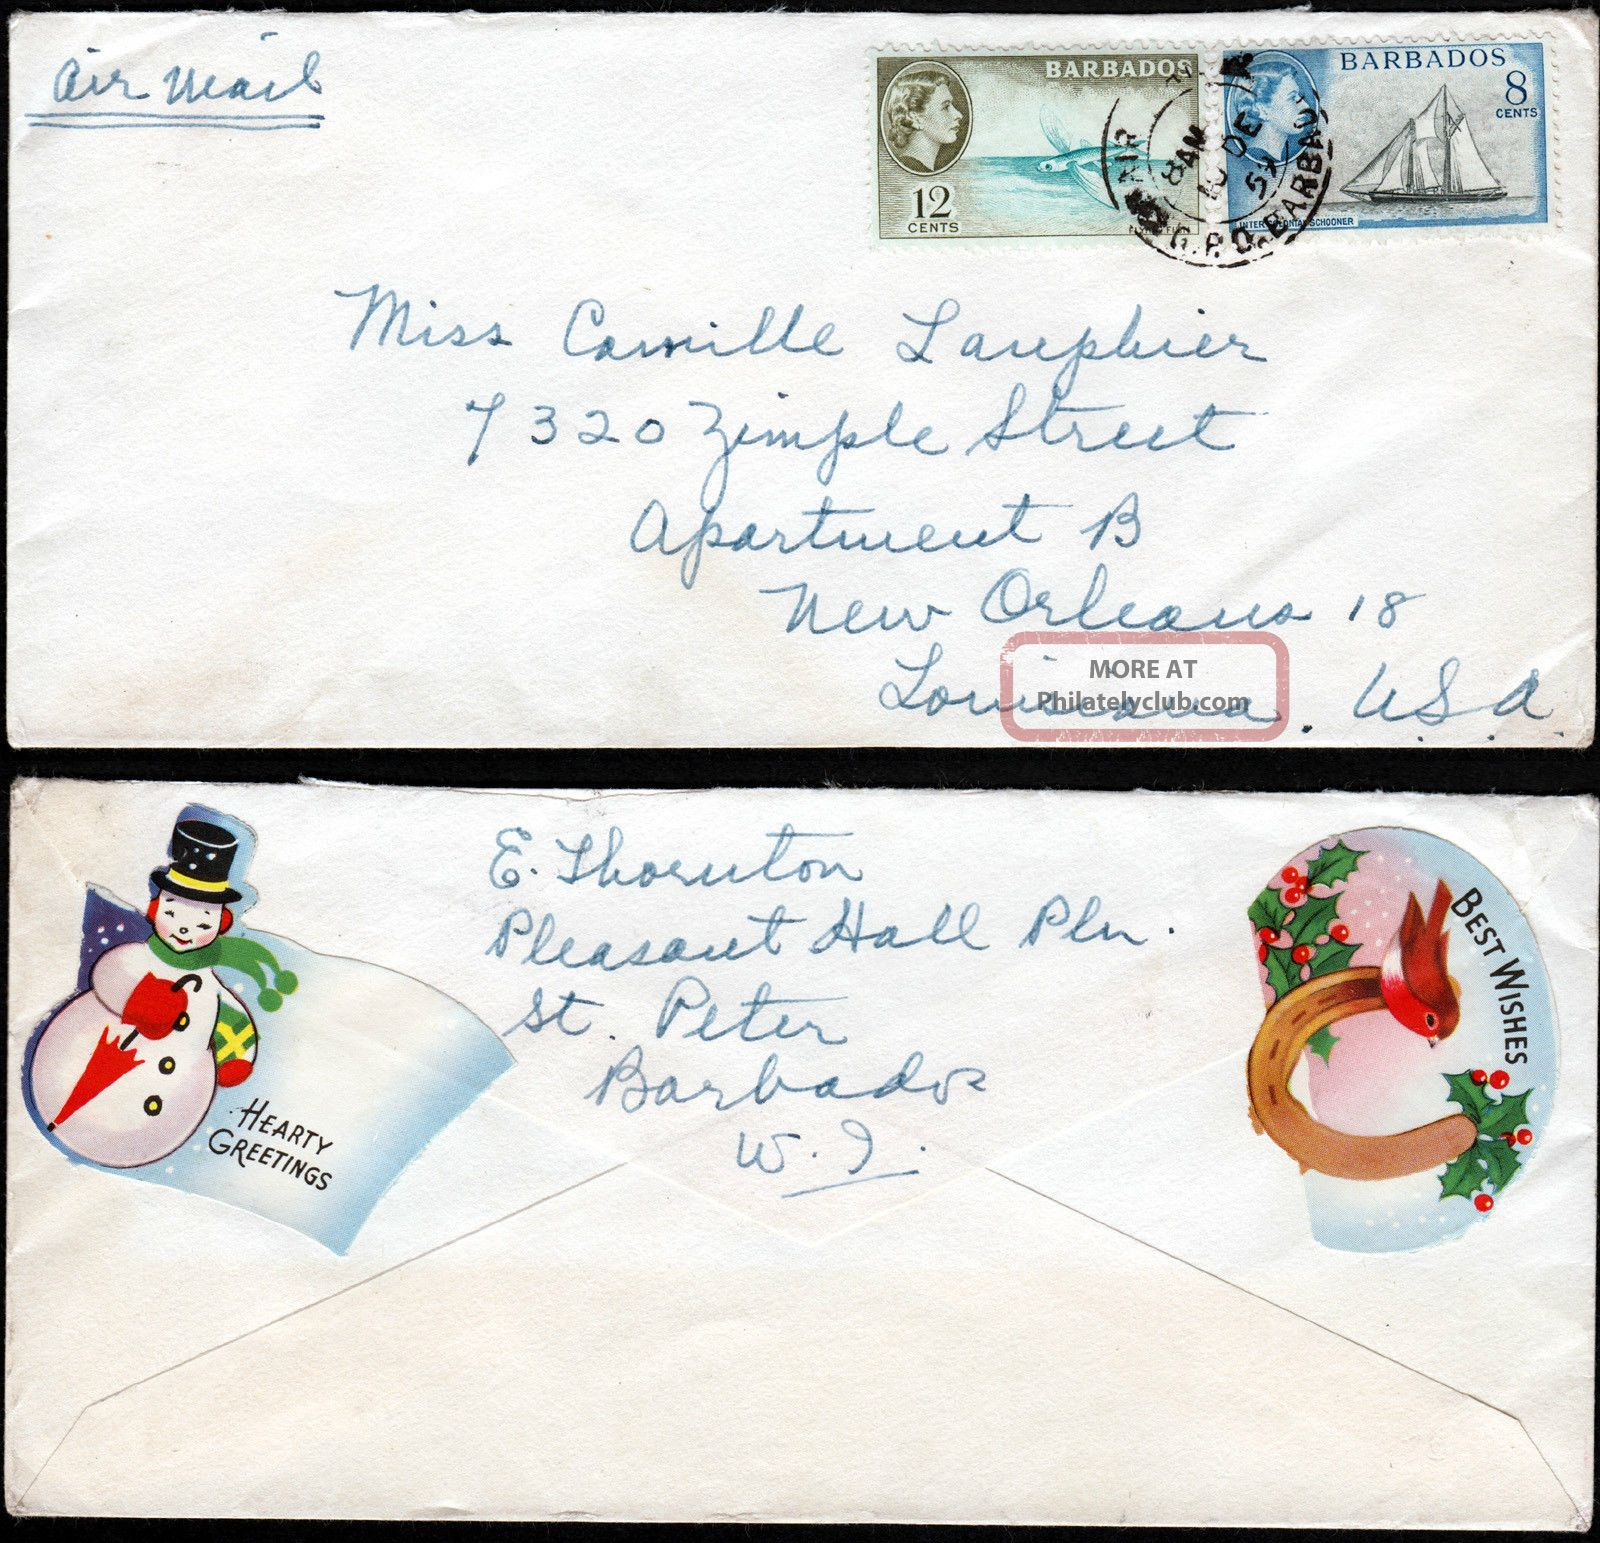 Barbados - Usa 1959 Airmail Cover F/w Qeii 8c & 12c Canc Unlcear Cds British Colonies & Territories photo